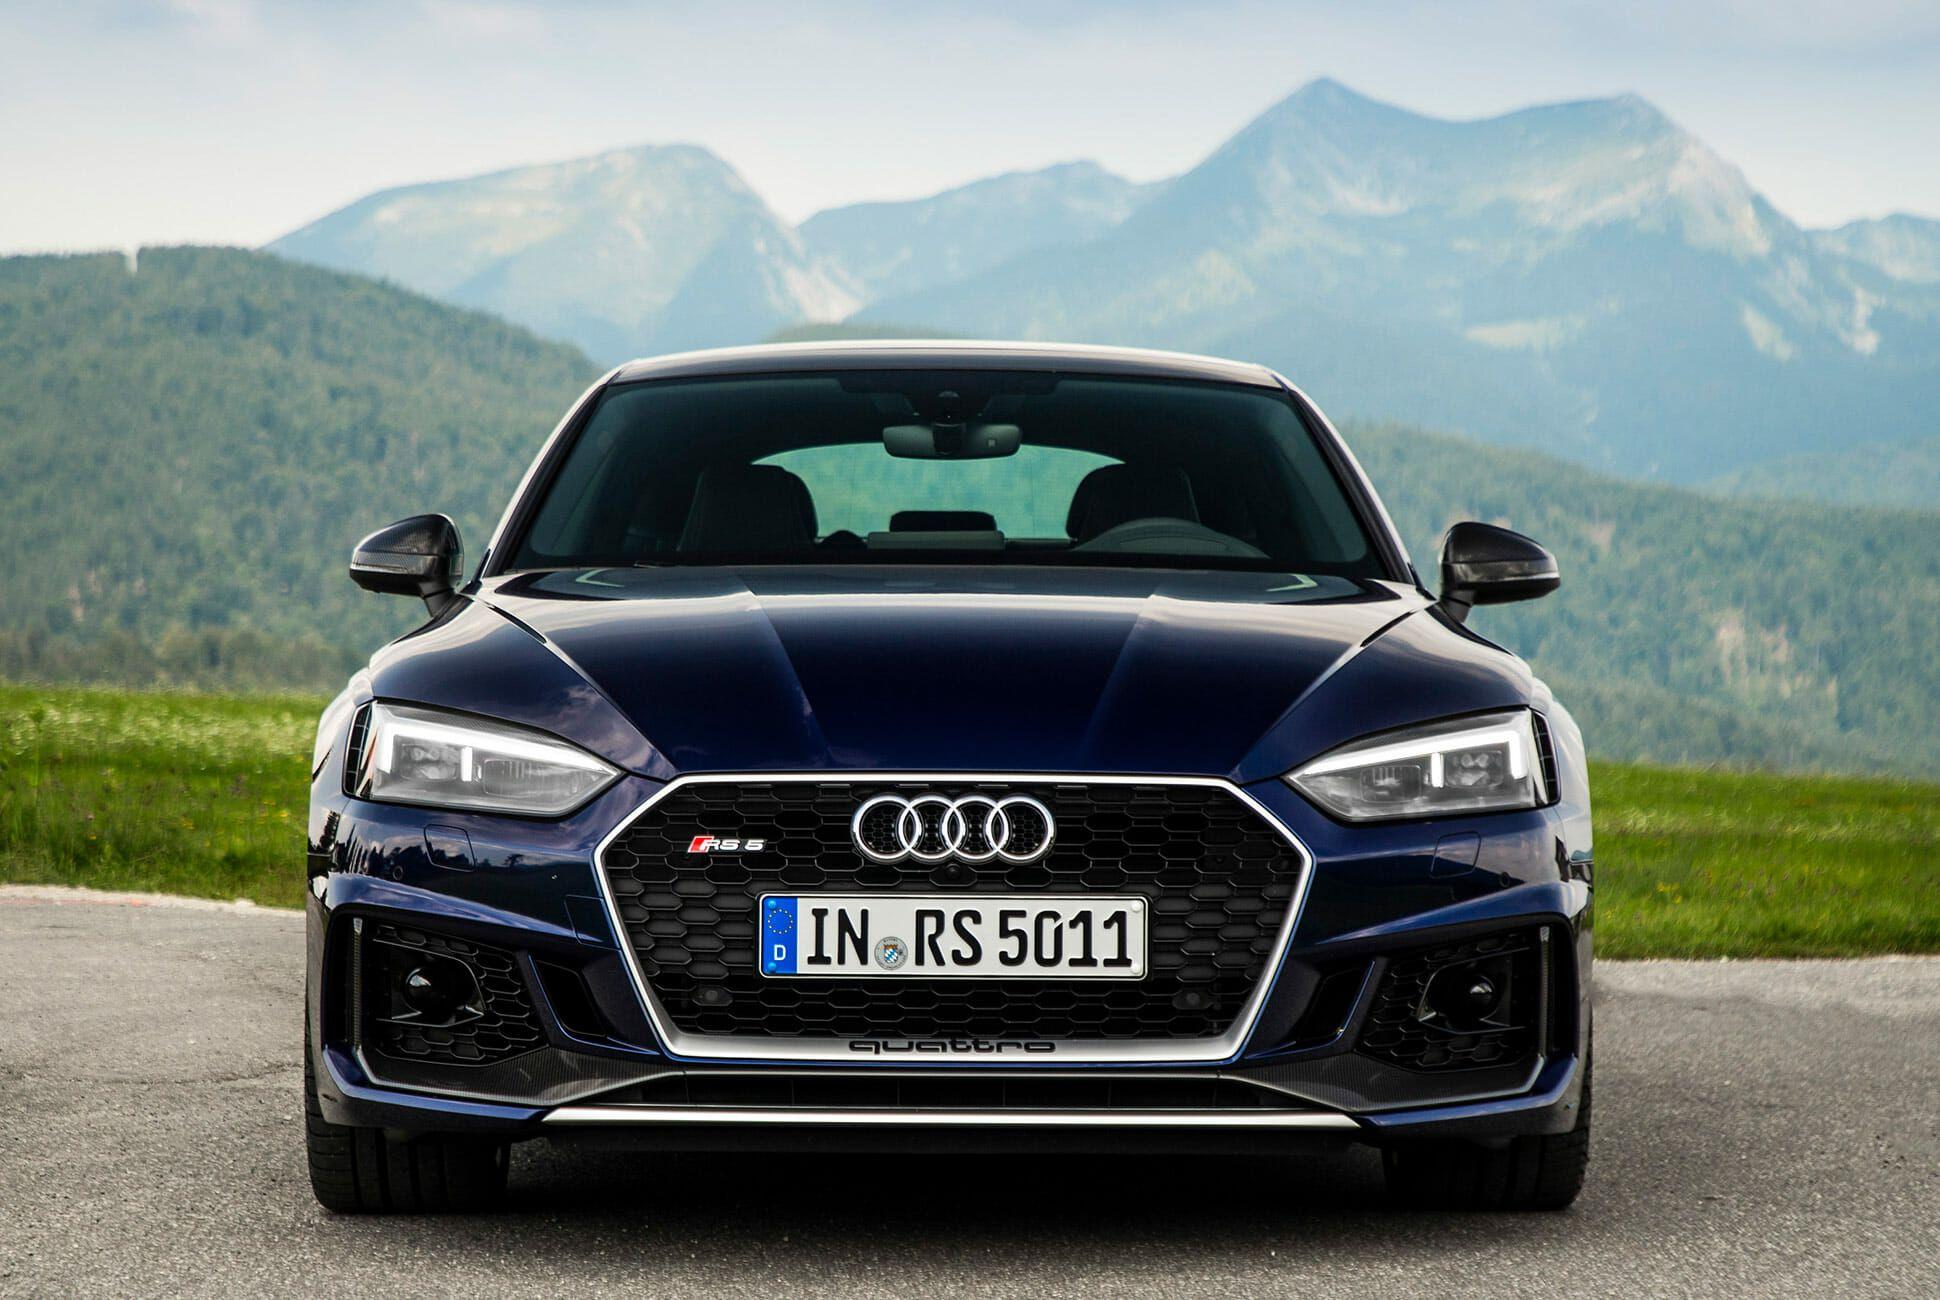 Audi-RS5-Sportback-Review-gear-patrol-slide-2